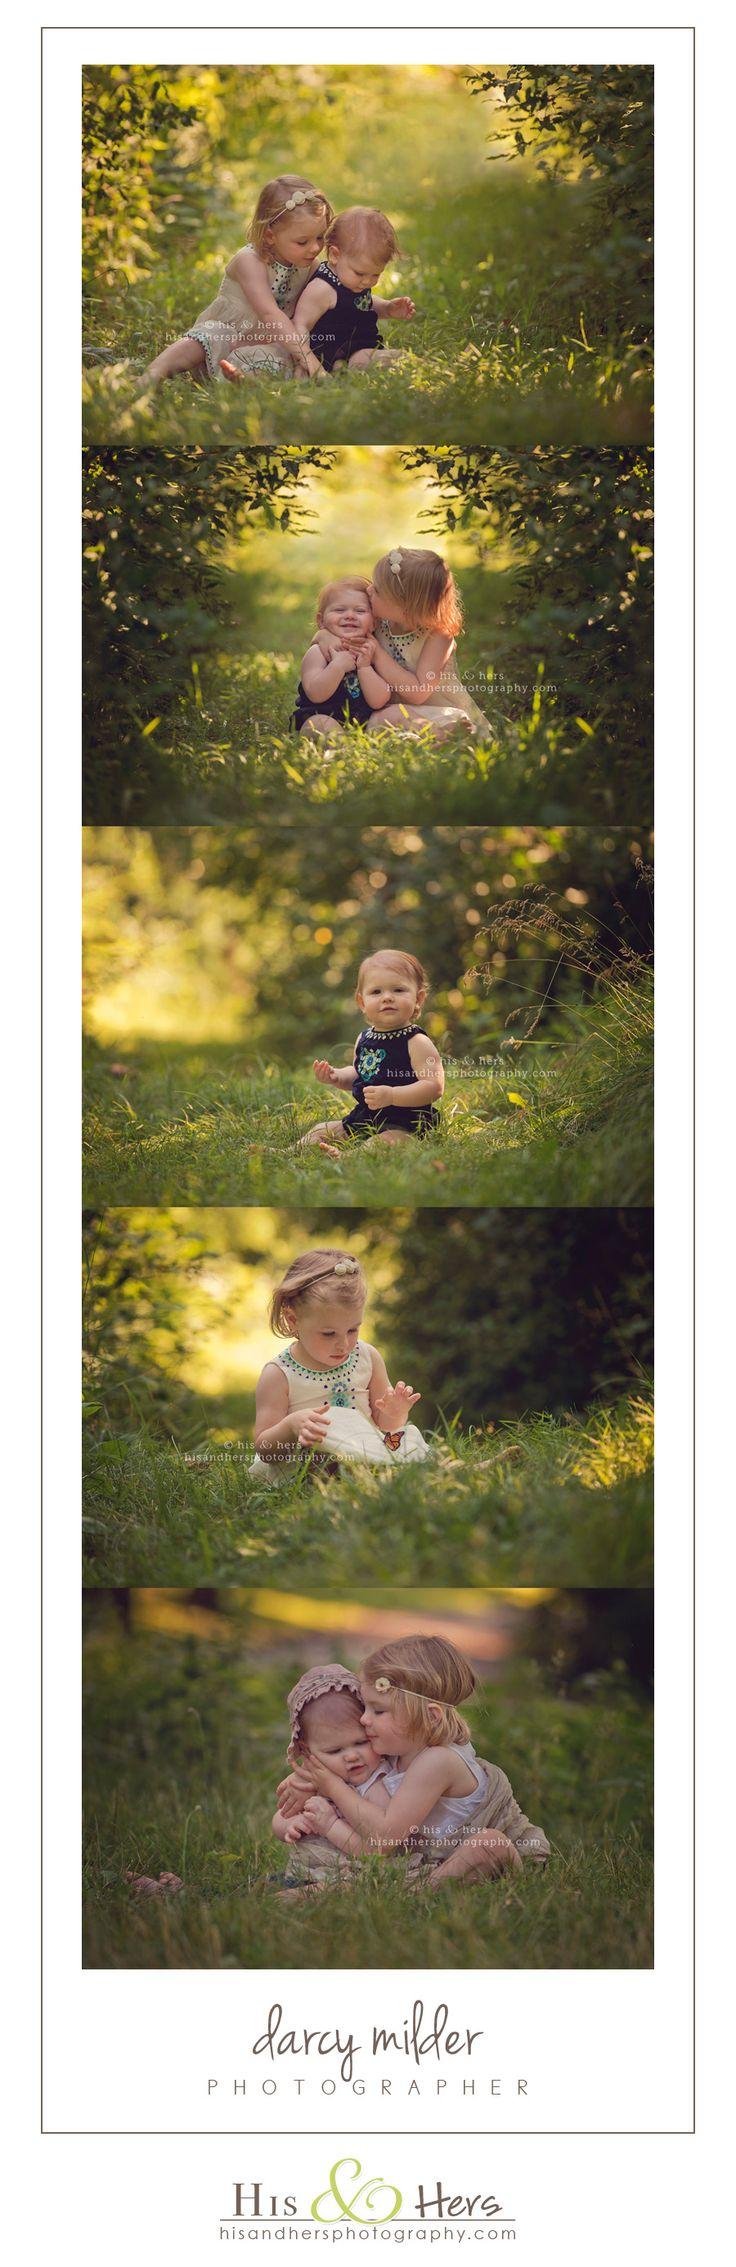 #Iowa family #photographer | Darcy Milder, His & Hers